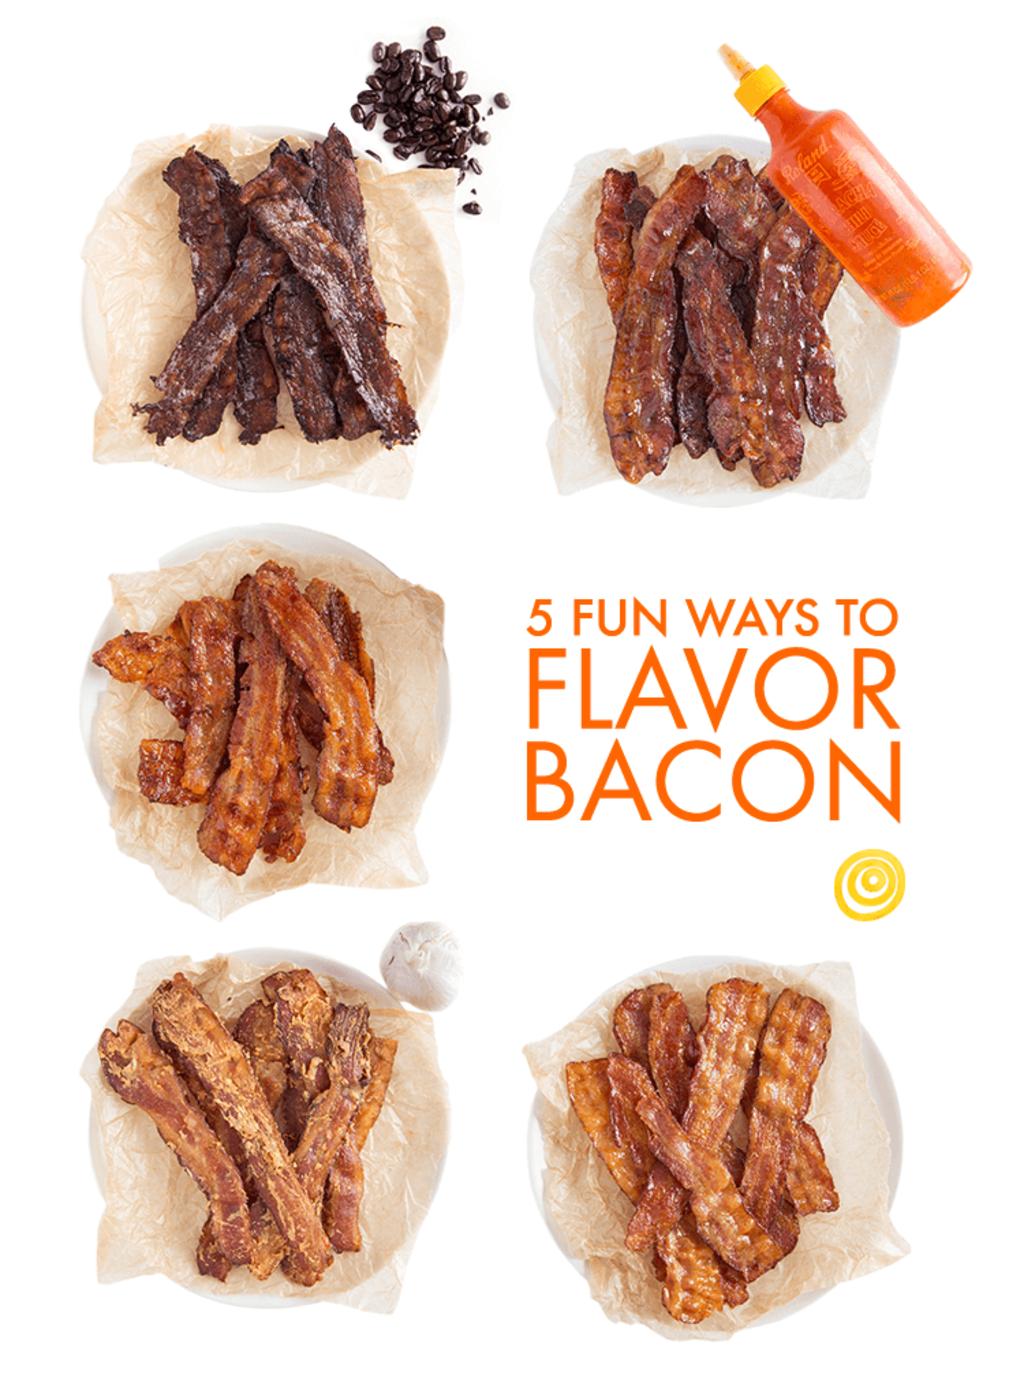 5 Fun Ways to Flavor Bacon